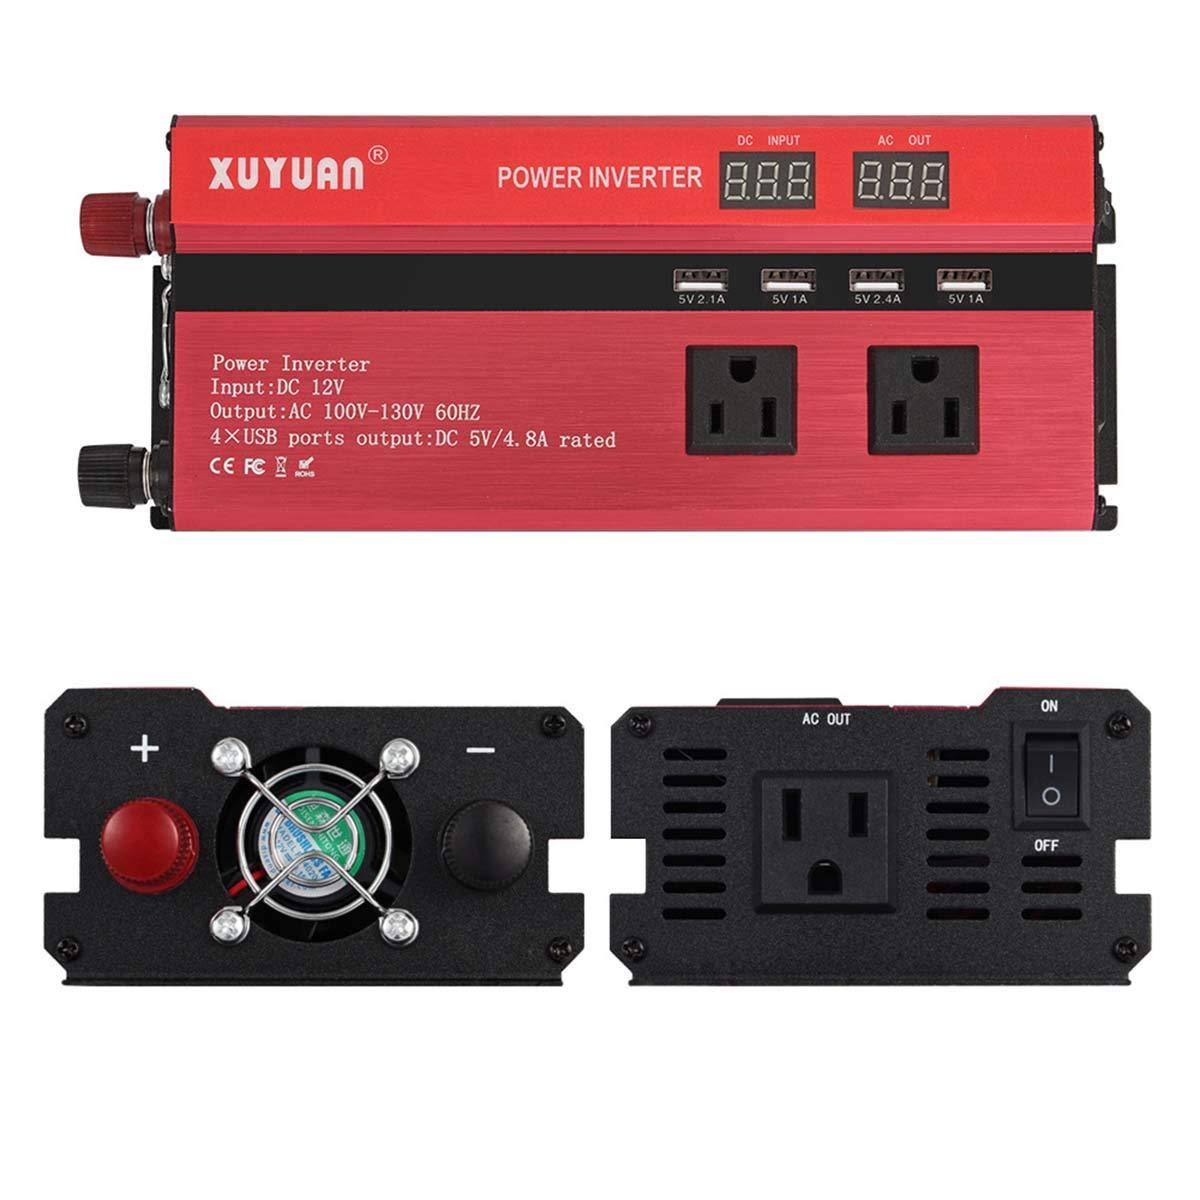 Color : 110V//3000W Nosii 3000W 220V Convertidor de Onda sinusoidal con Pantalla Digital 4 Puertos USB 5000W Inversor de Corriente para autom/óvil DC 12V A CA 110V 4000W